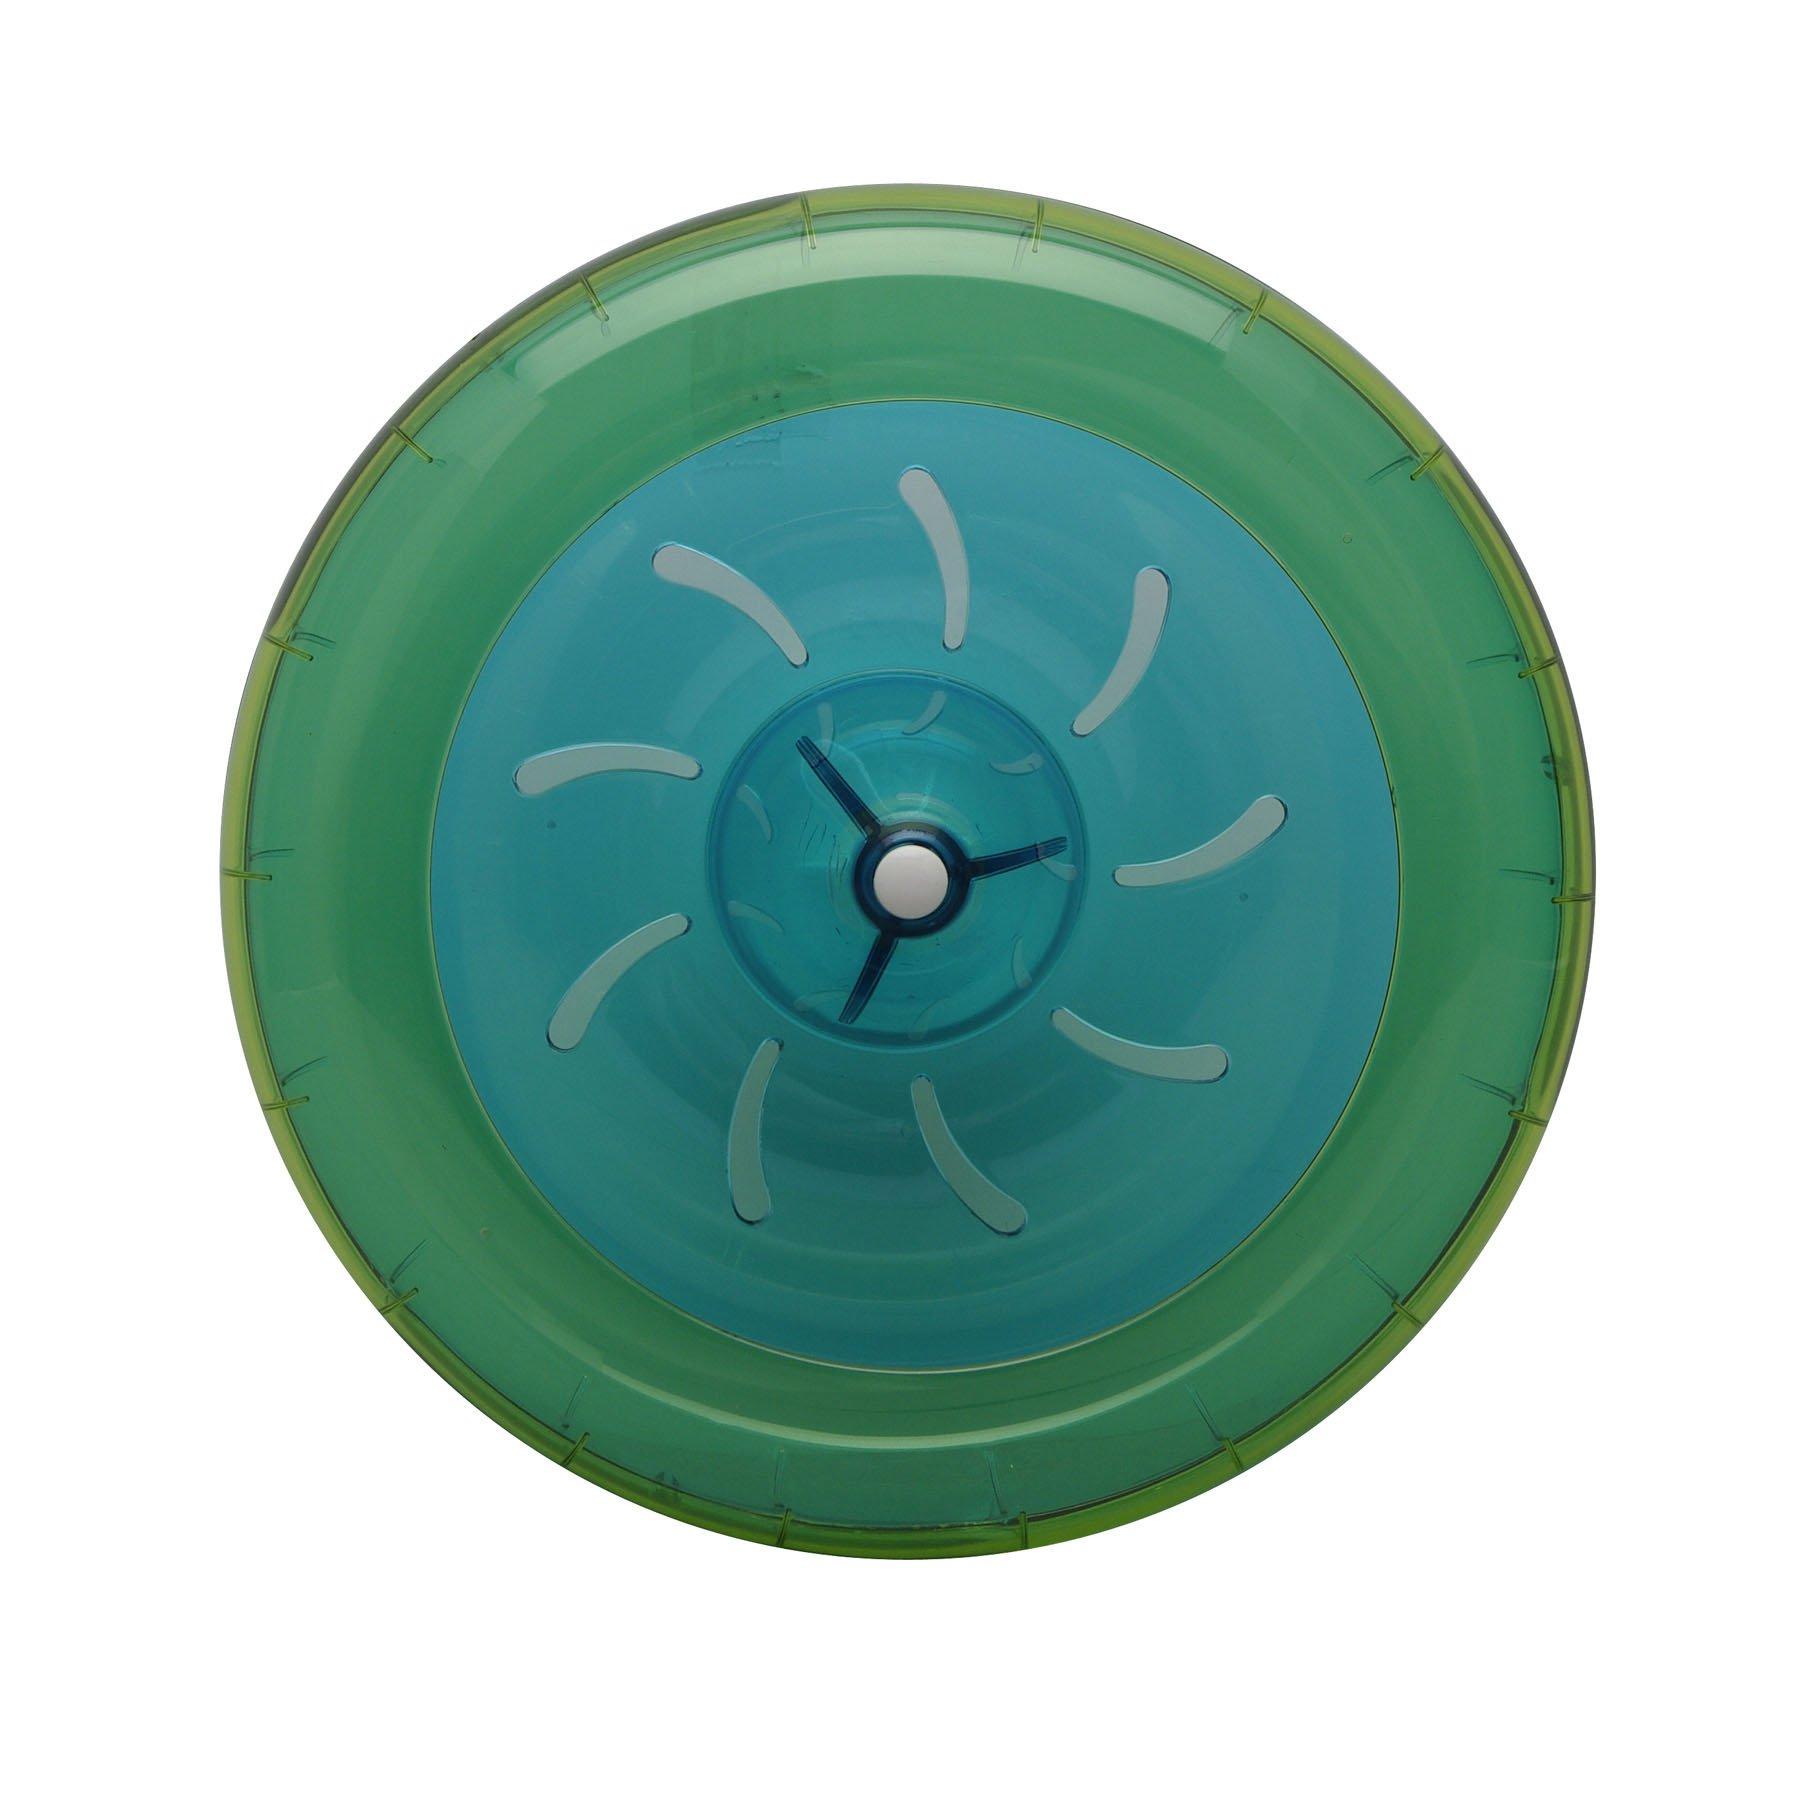 Habitrail OVO Wheel for Dwarf Hamster Habitat, Lime Green/Blue